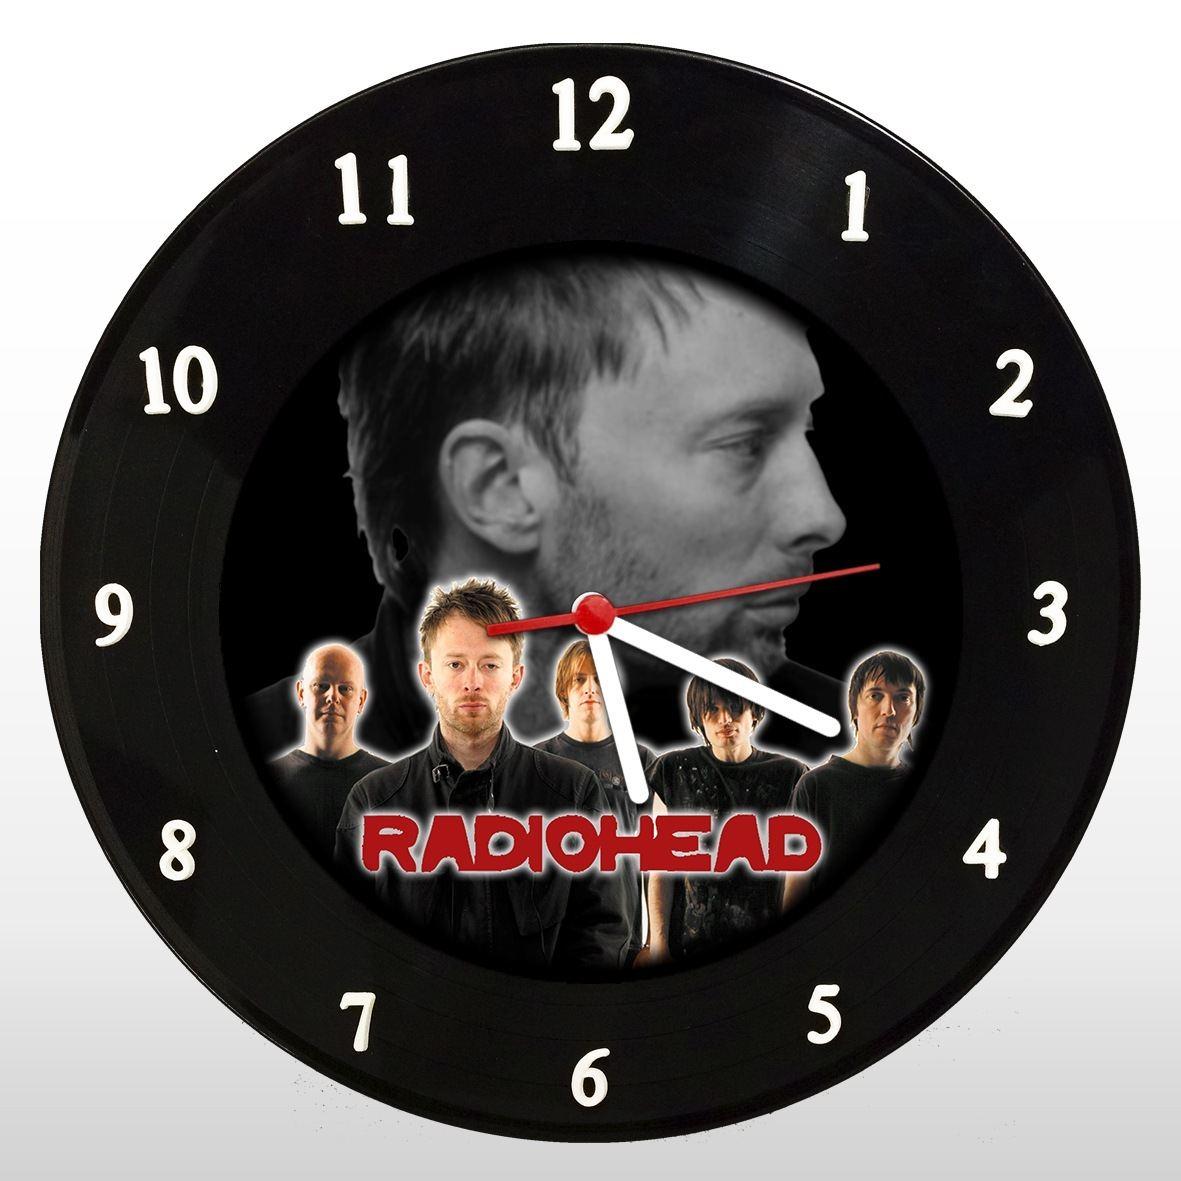 Radiohead - Relógio de Parede em Disco de Vinil - Mr. Rock